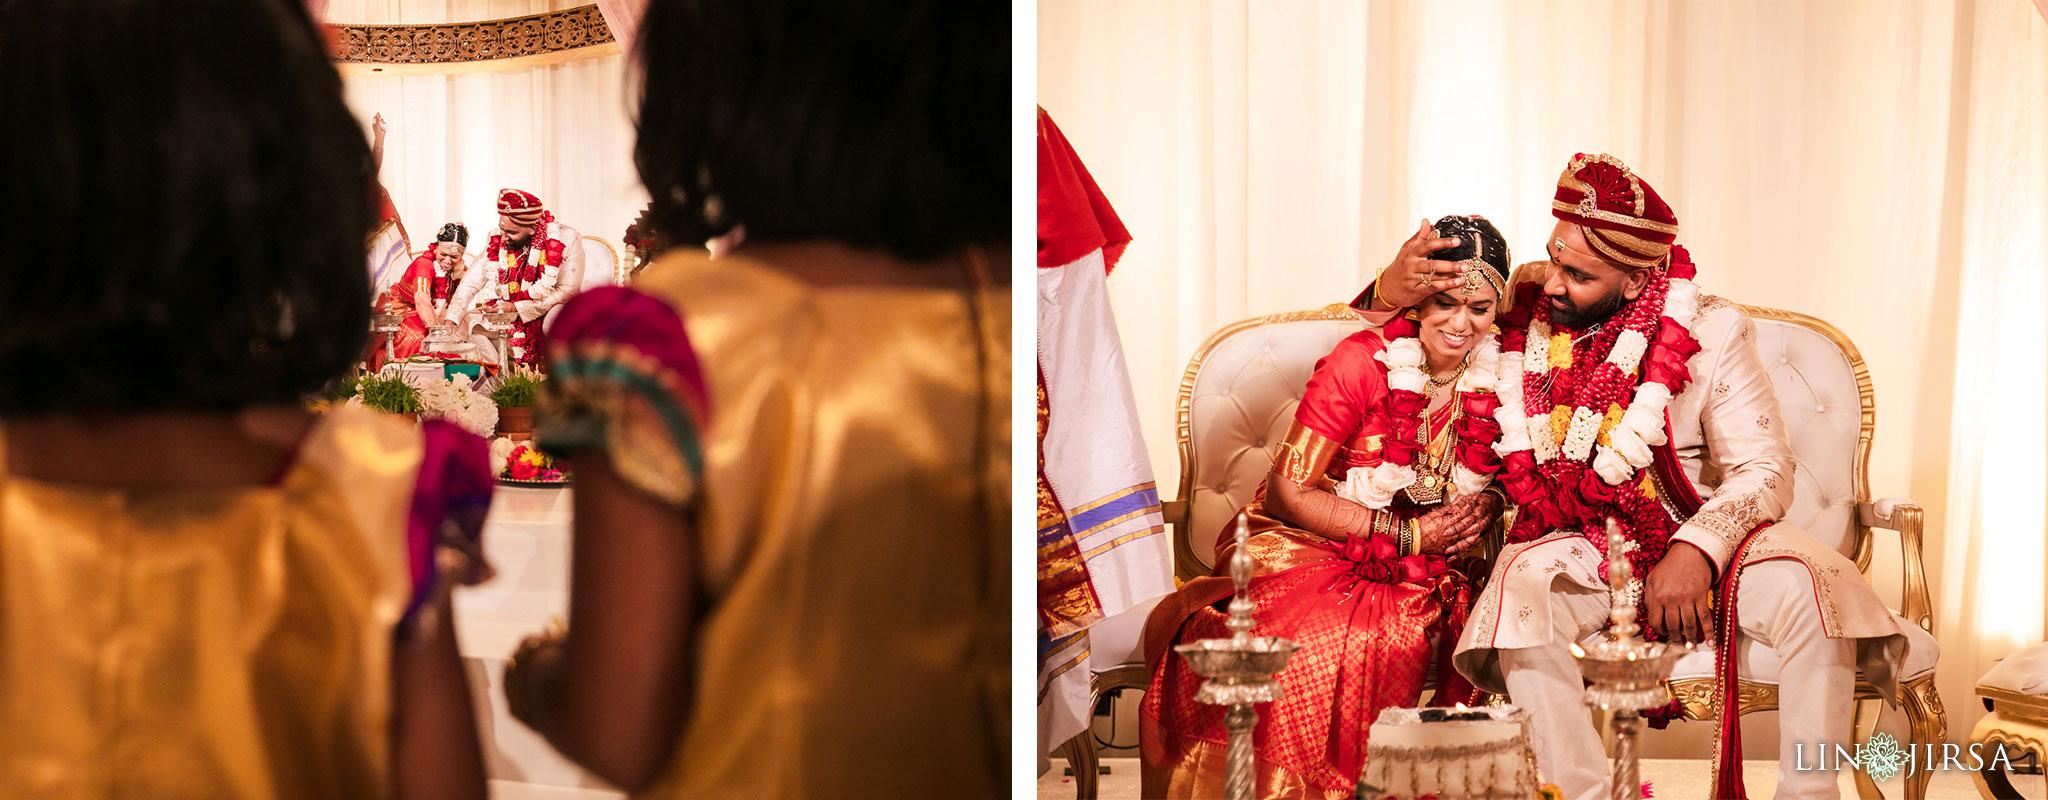 20 long beach hyatt south indian wedding photography